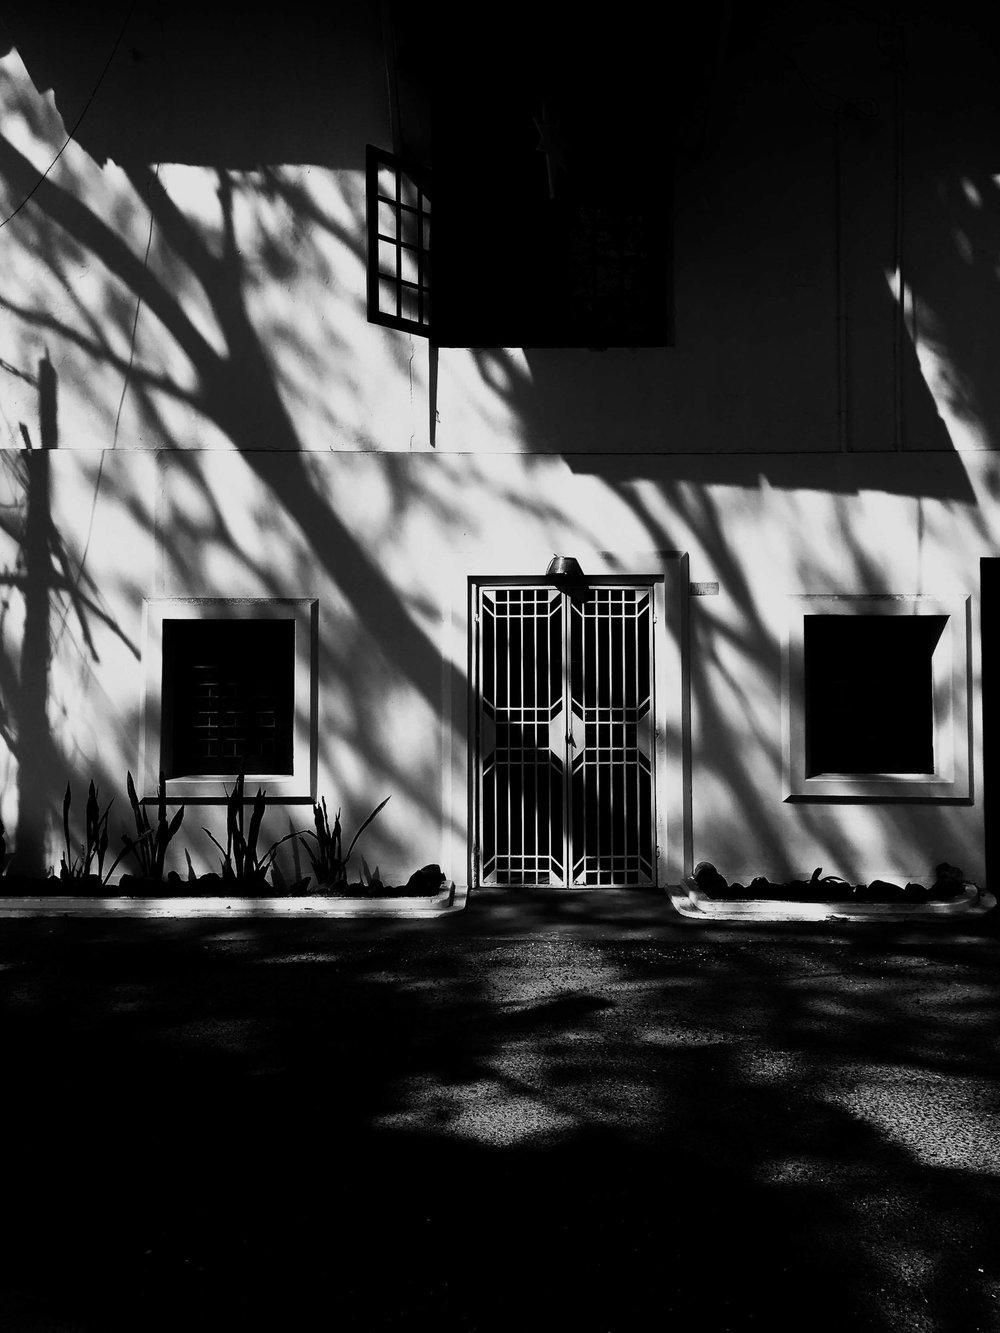 Sindhur_Photography_Kochi Muziris Biennale -2019-23.JPG